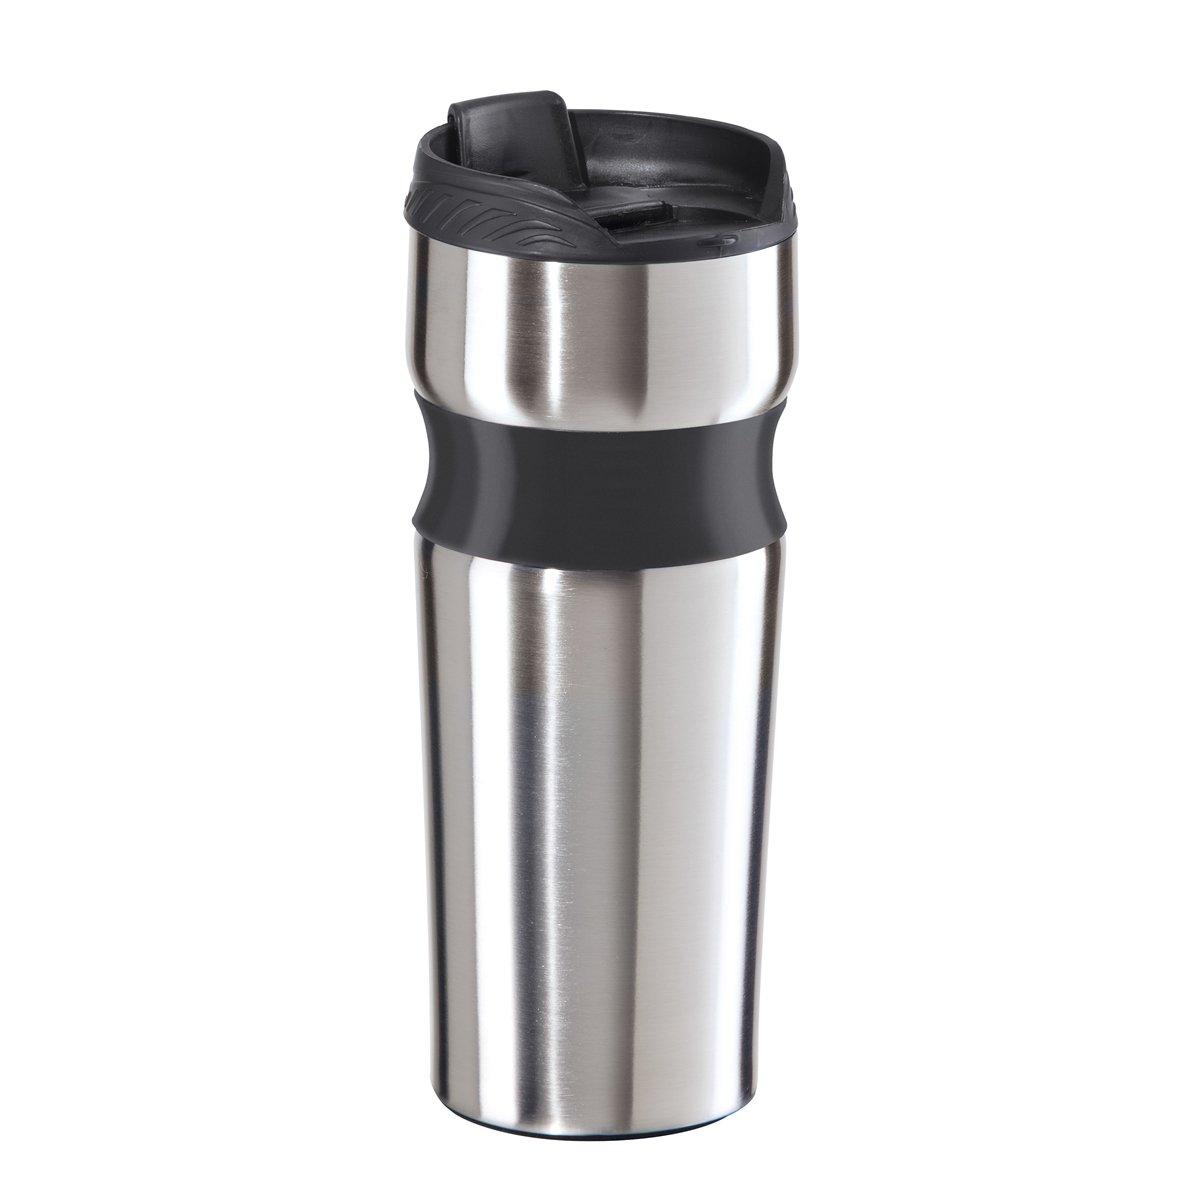 amazoncom oggi stainless steel lustre contour travel mug stainless coffee travel mug kitchen u0026 dining - Coffee Travel Mugs